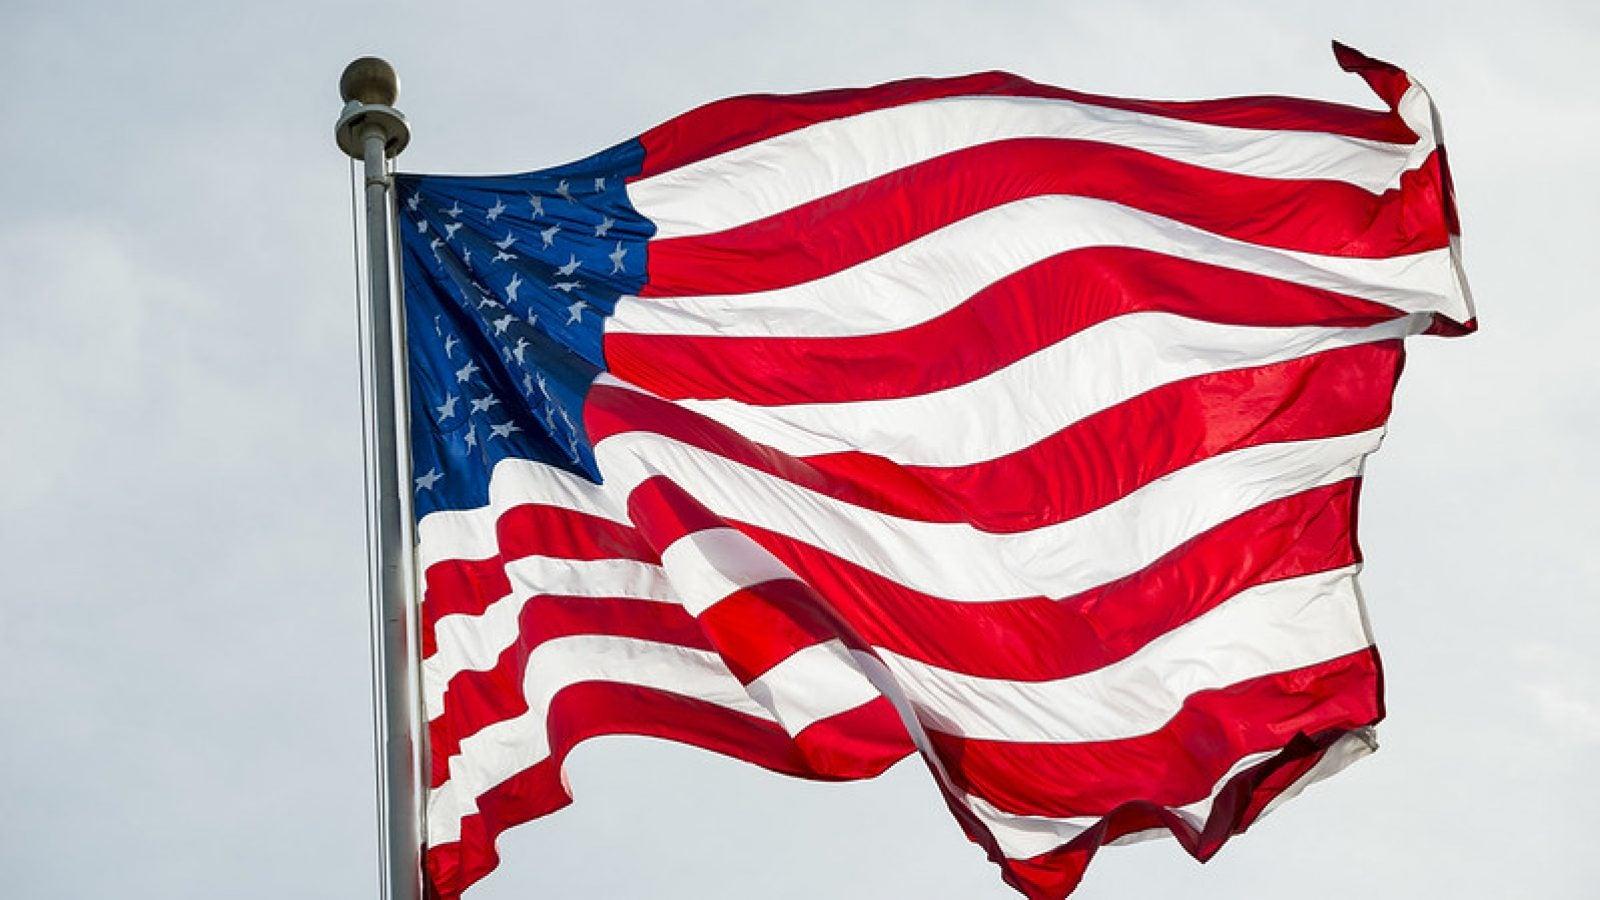 A U.S. flag flies in the wind